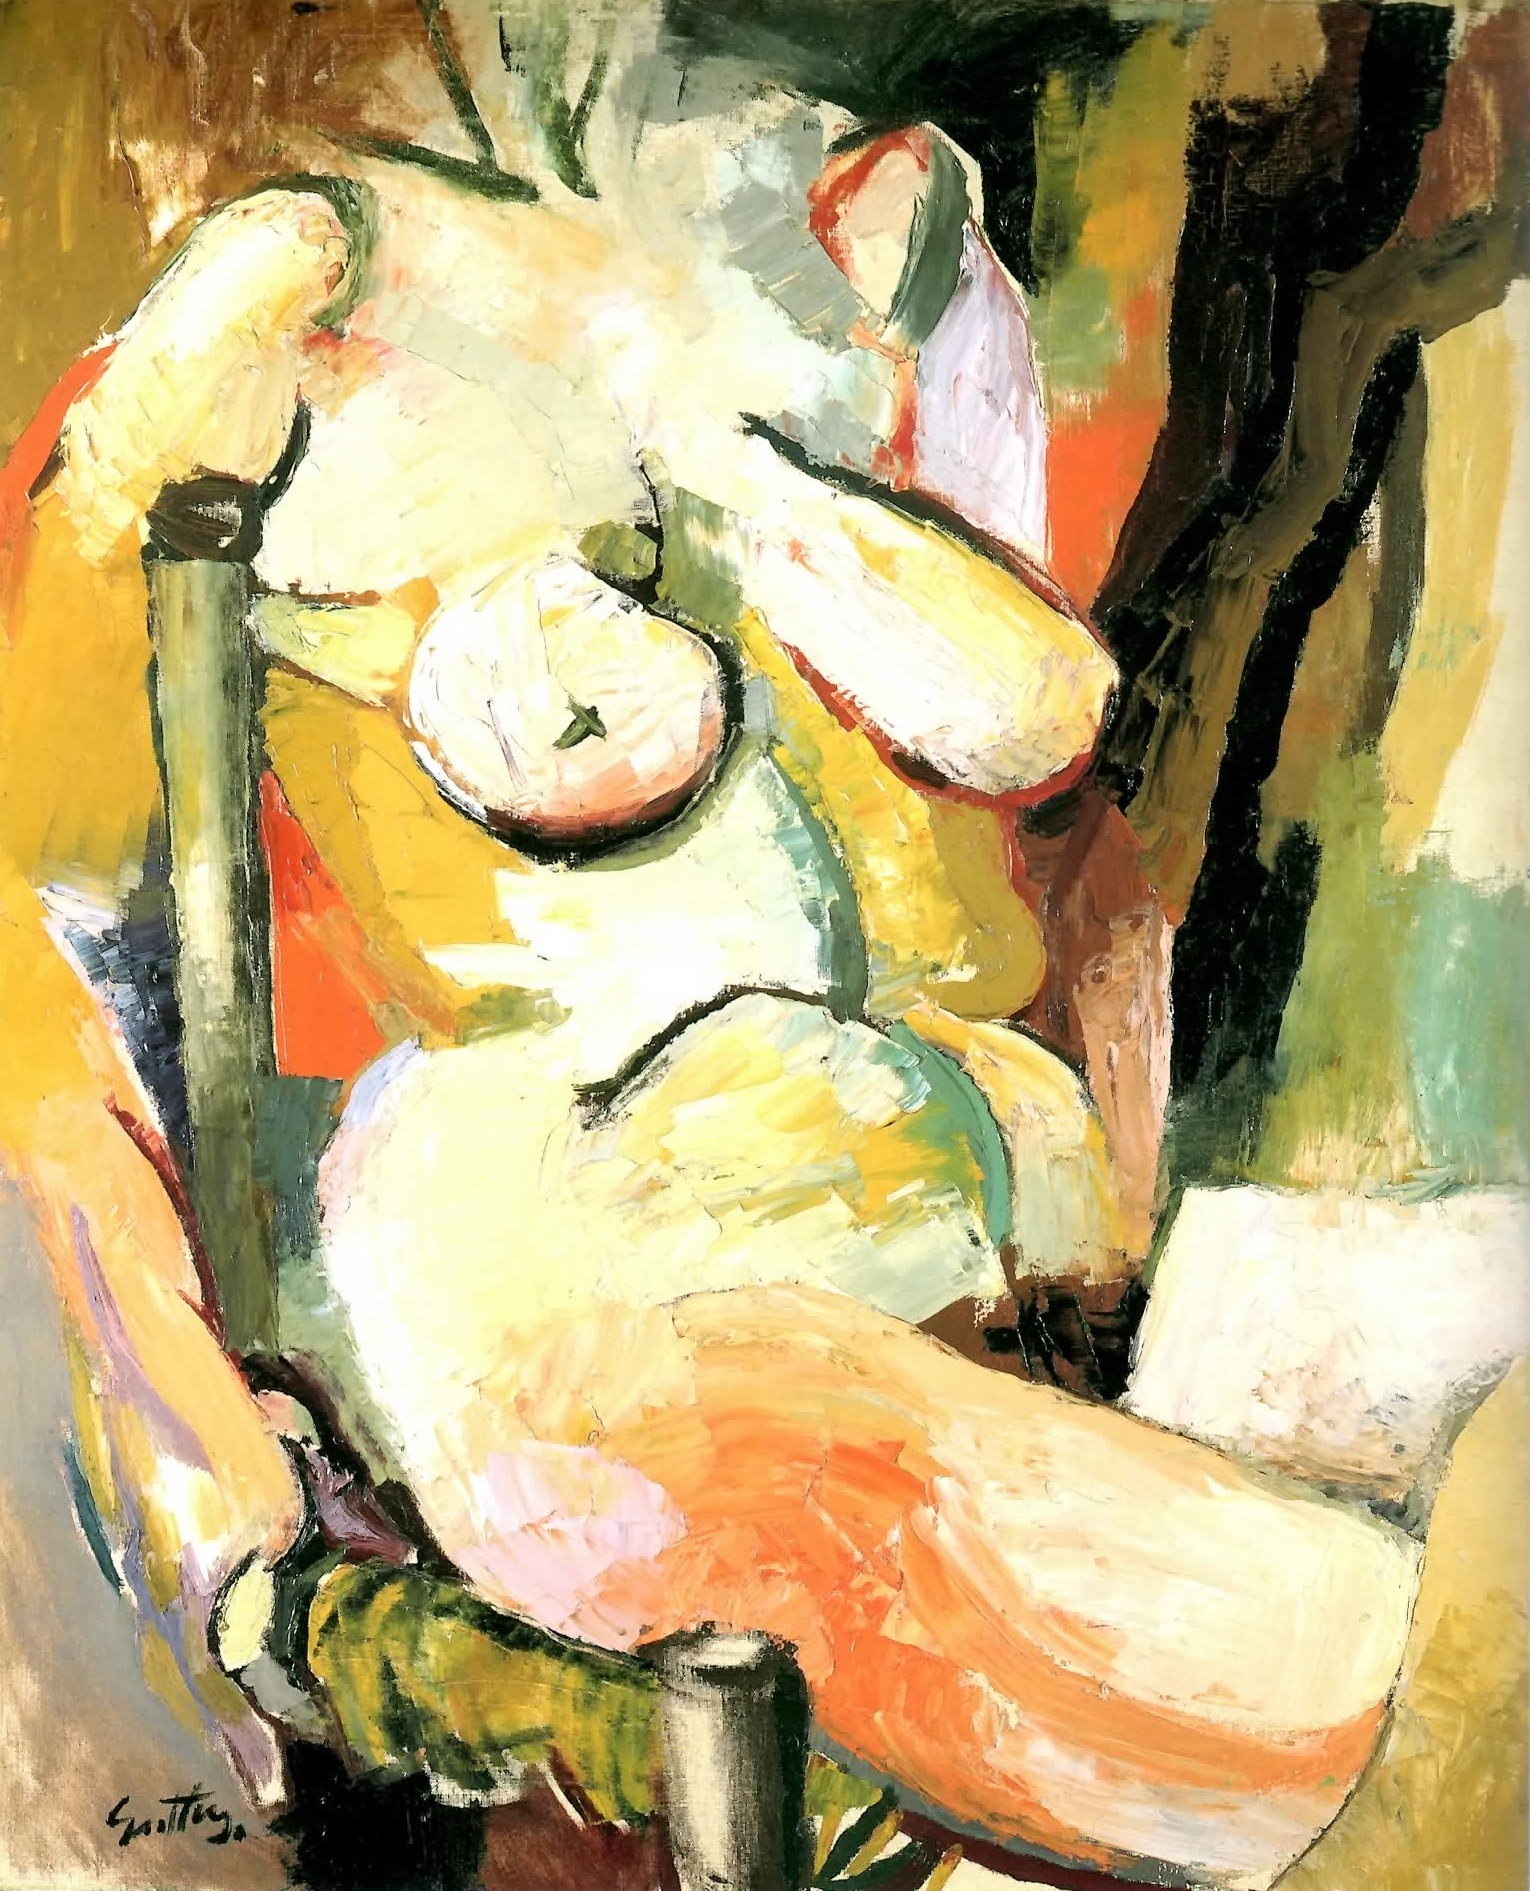 Renato Guttuso - Nudo